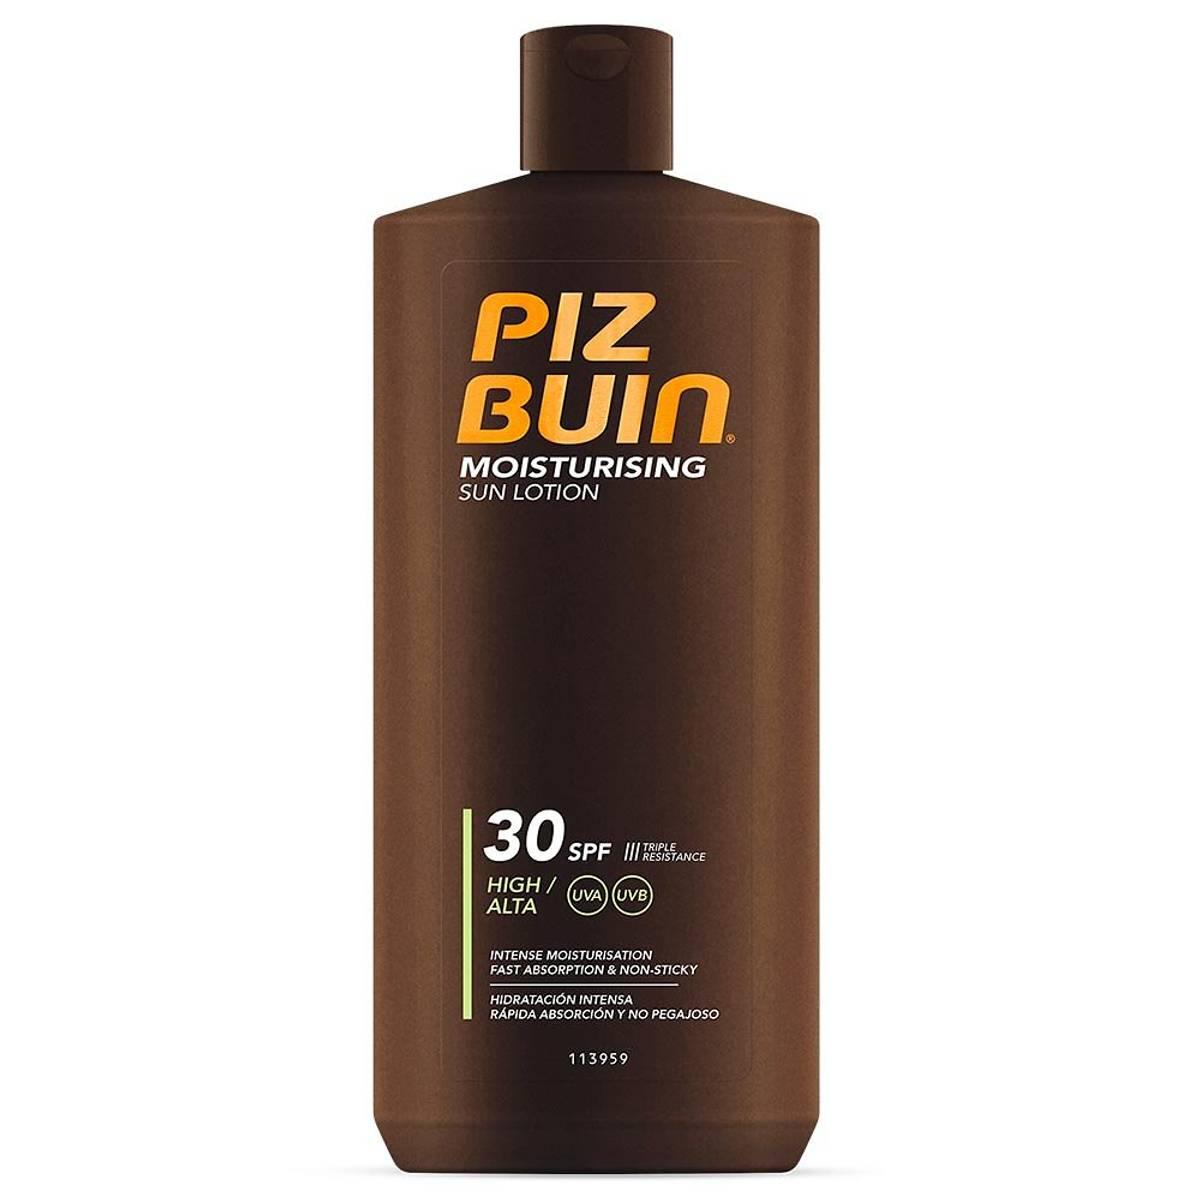 Piz buin moist sun lot f30 400 ml